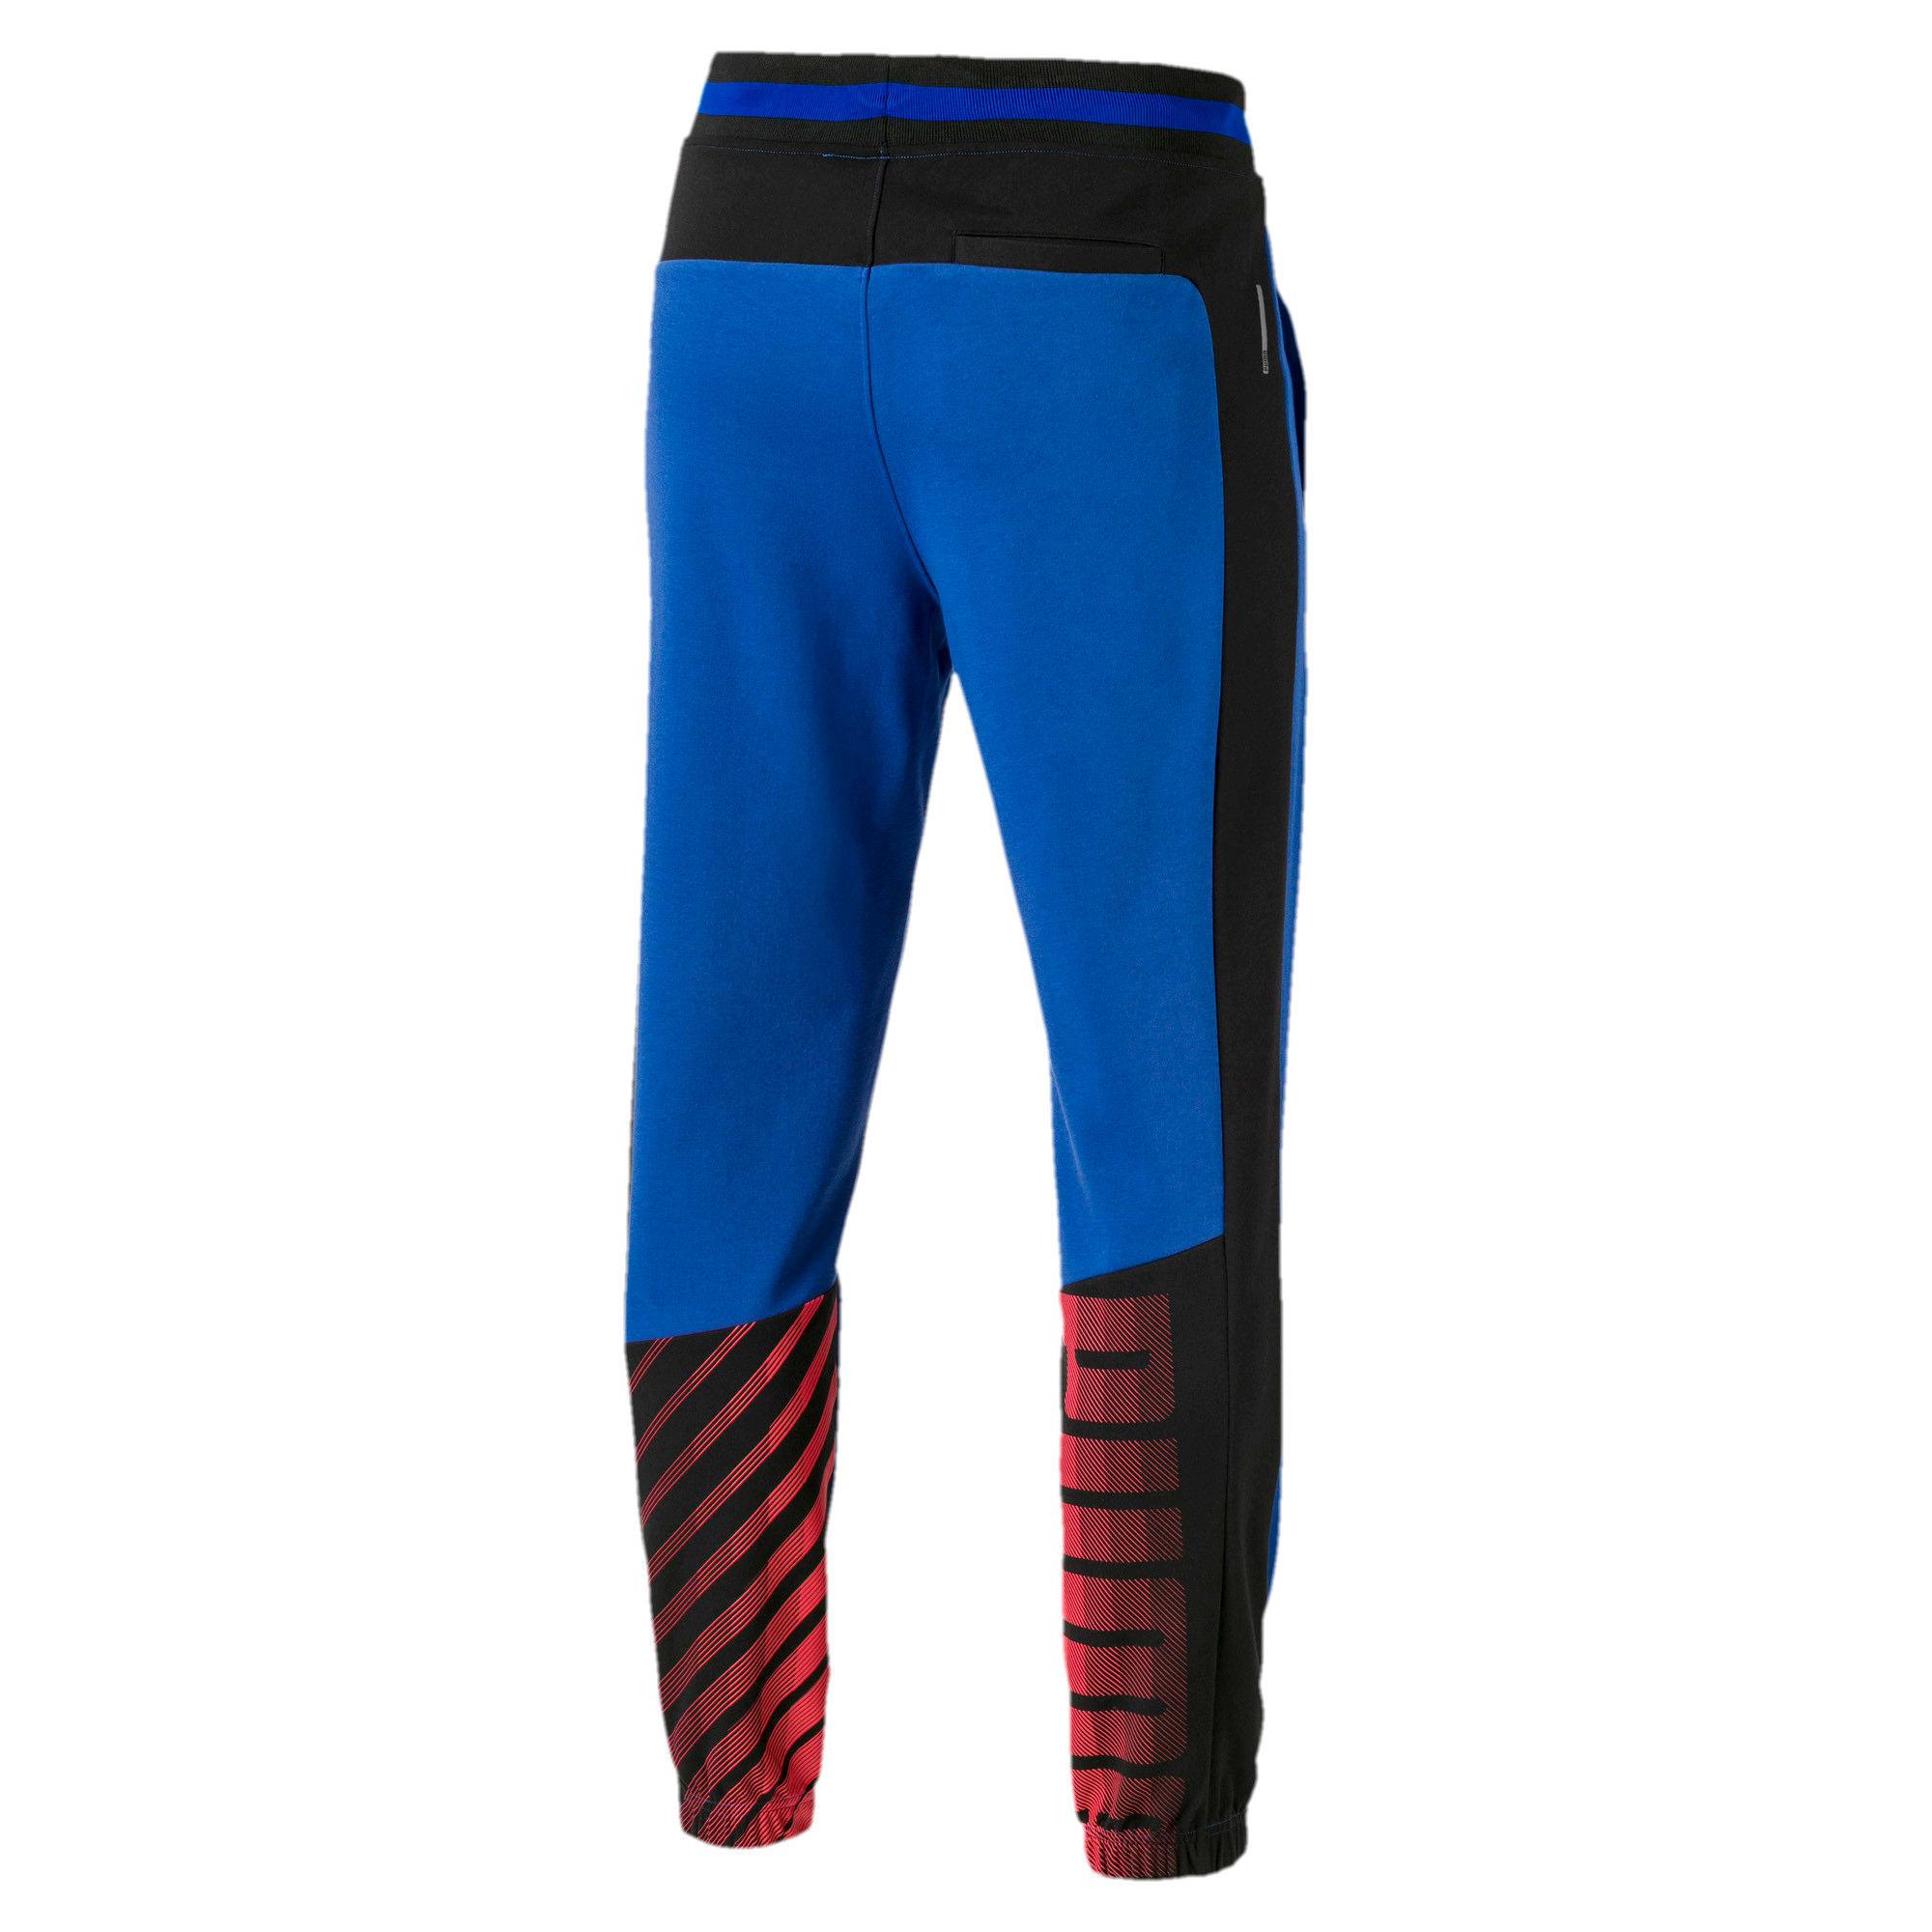 Thumbnail 5 of Collective Men's Sweatpants, Galaxy Blue, medium